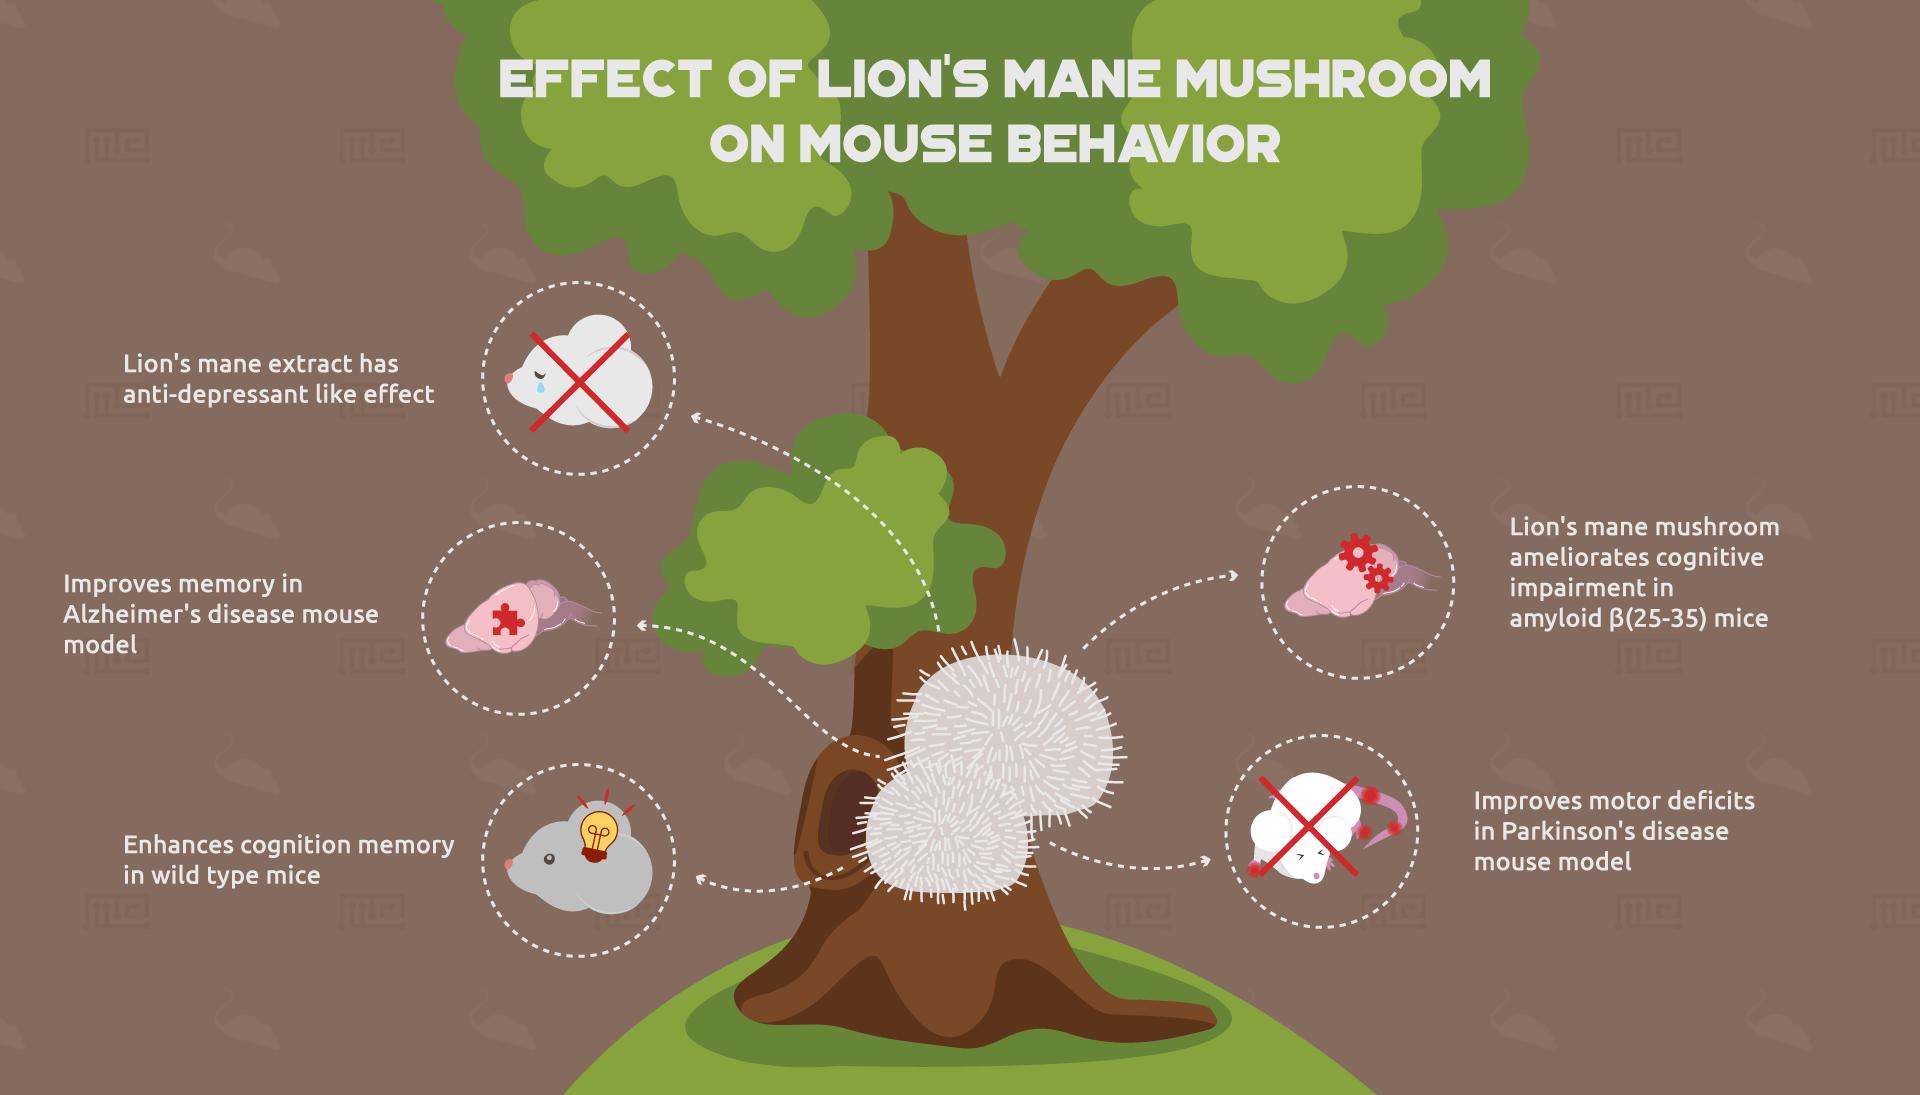 Effect-of-Lion's-mane-mushroom-on-mouse-behavior-2